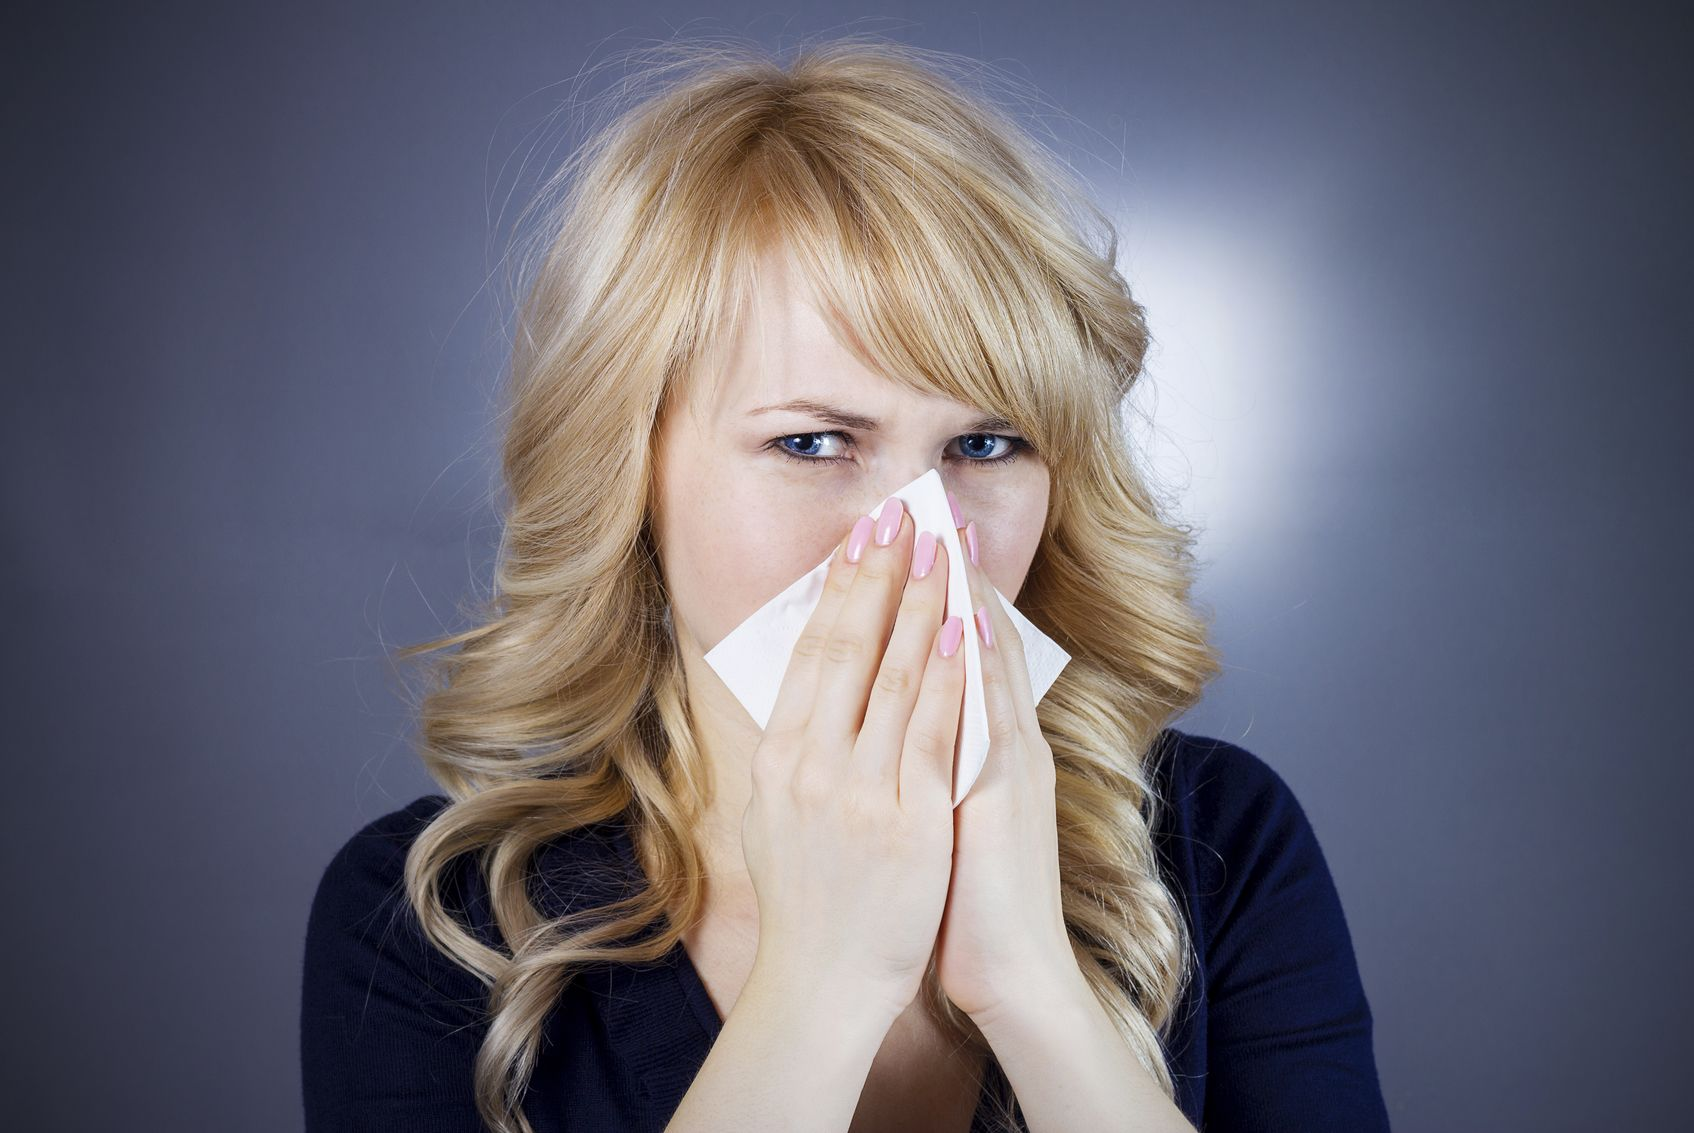 Stuffy Nose? This OTC Decongestant Won't Help